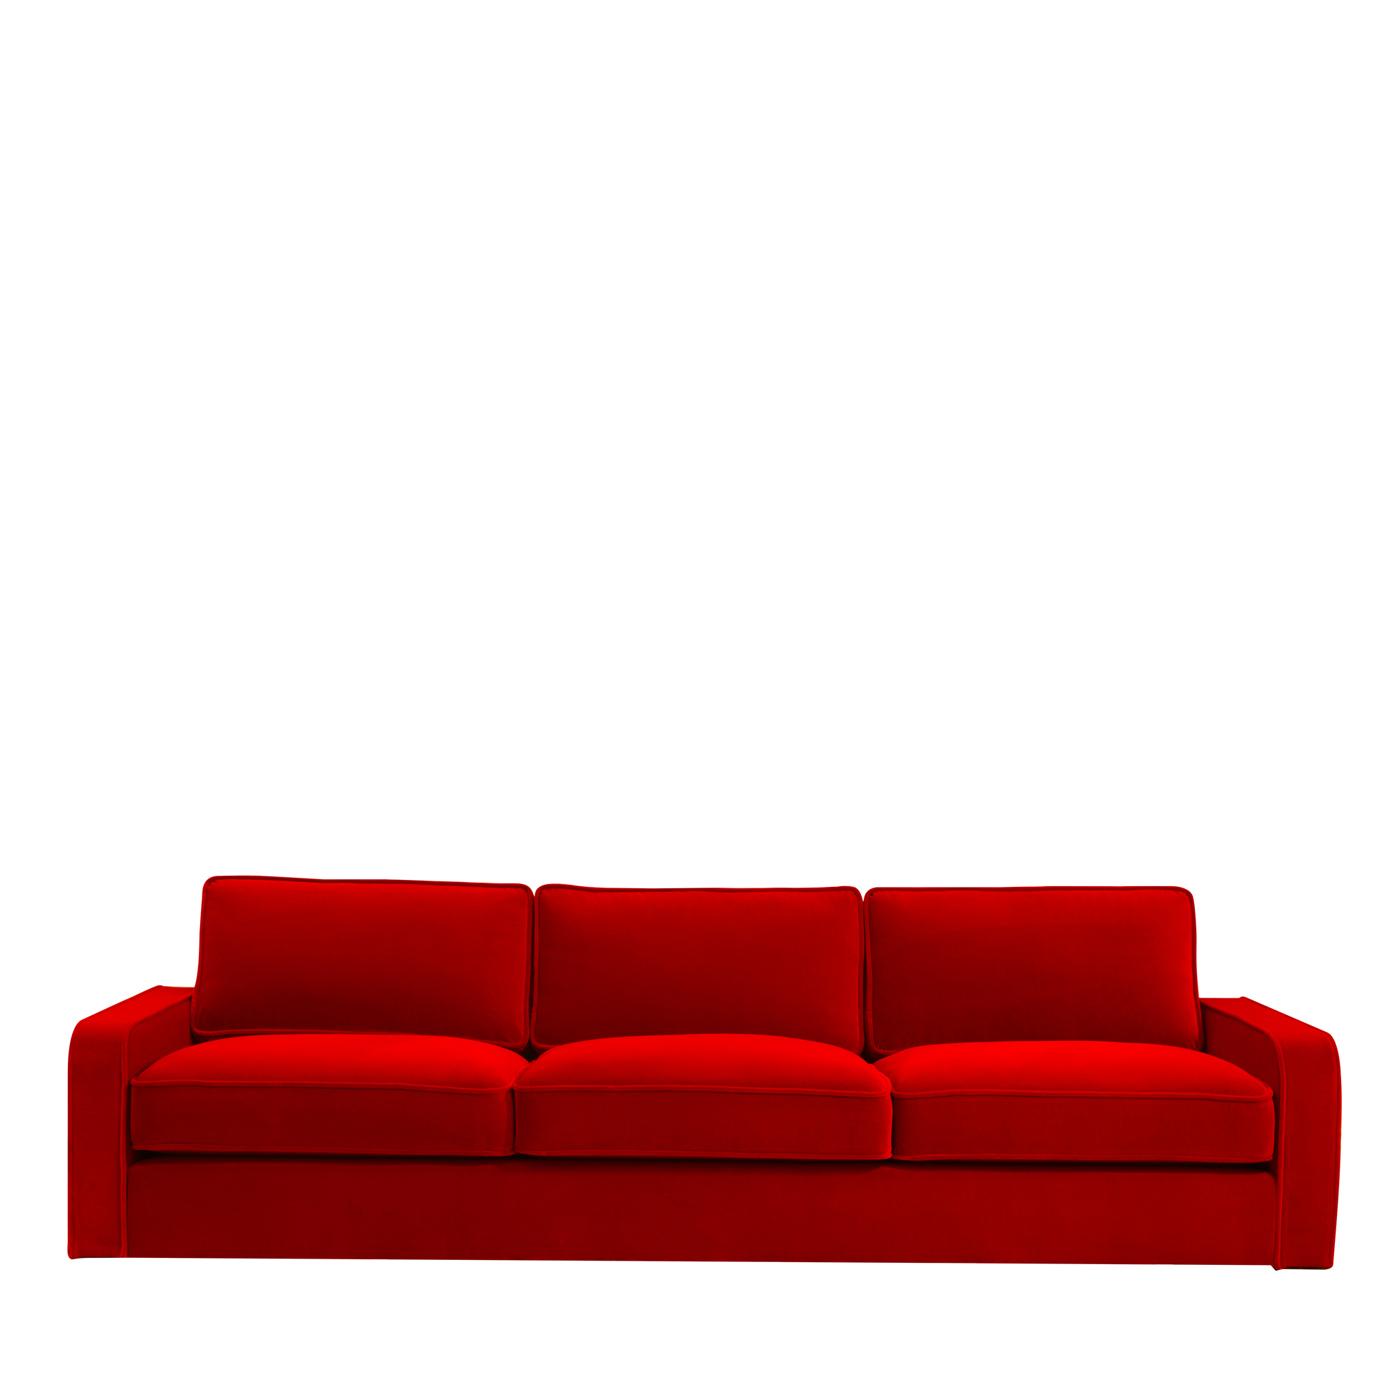 Amazing Romeo Red Sofa Sofas In 2019 Red Sofa Sofa Italian Short Links Chair Design For Home Short Linksinfo